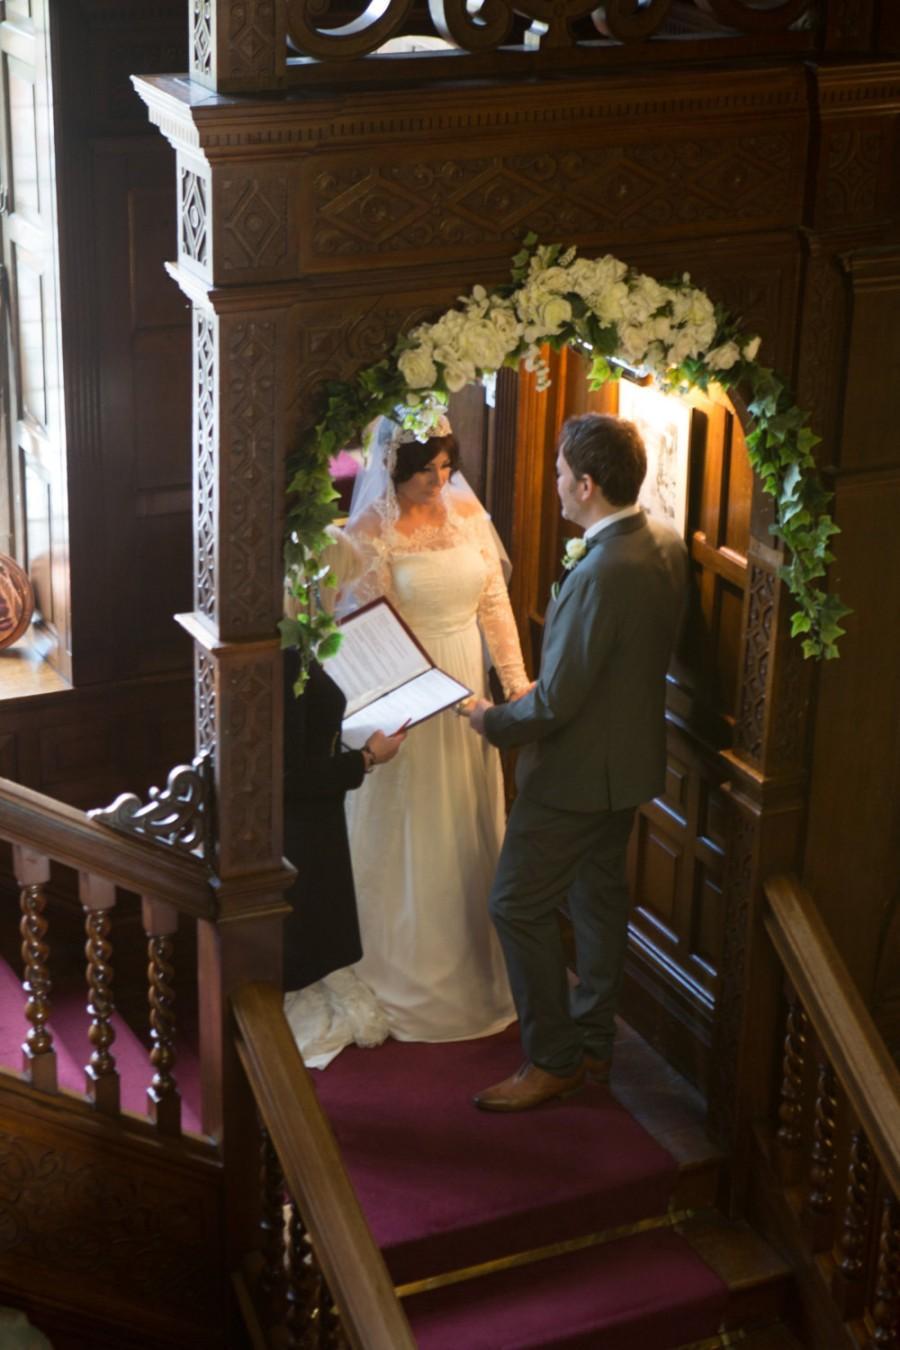 Свадьба - Wedding Arch Swag, Extra Large Wedding Swag, Church Swag, Rustic Wedding Swag, Arbor Swag, Church Wedding Swag